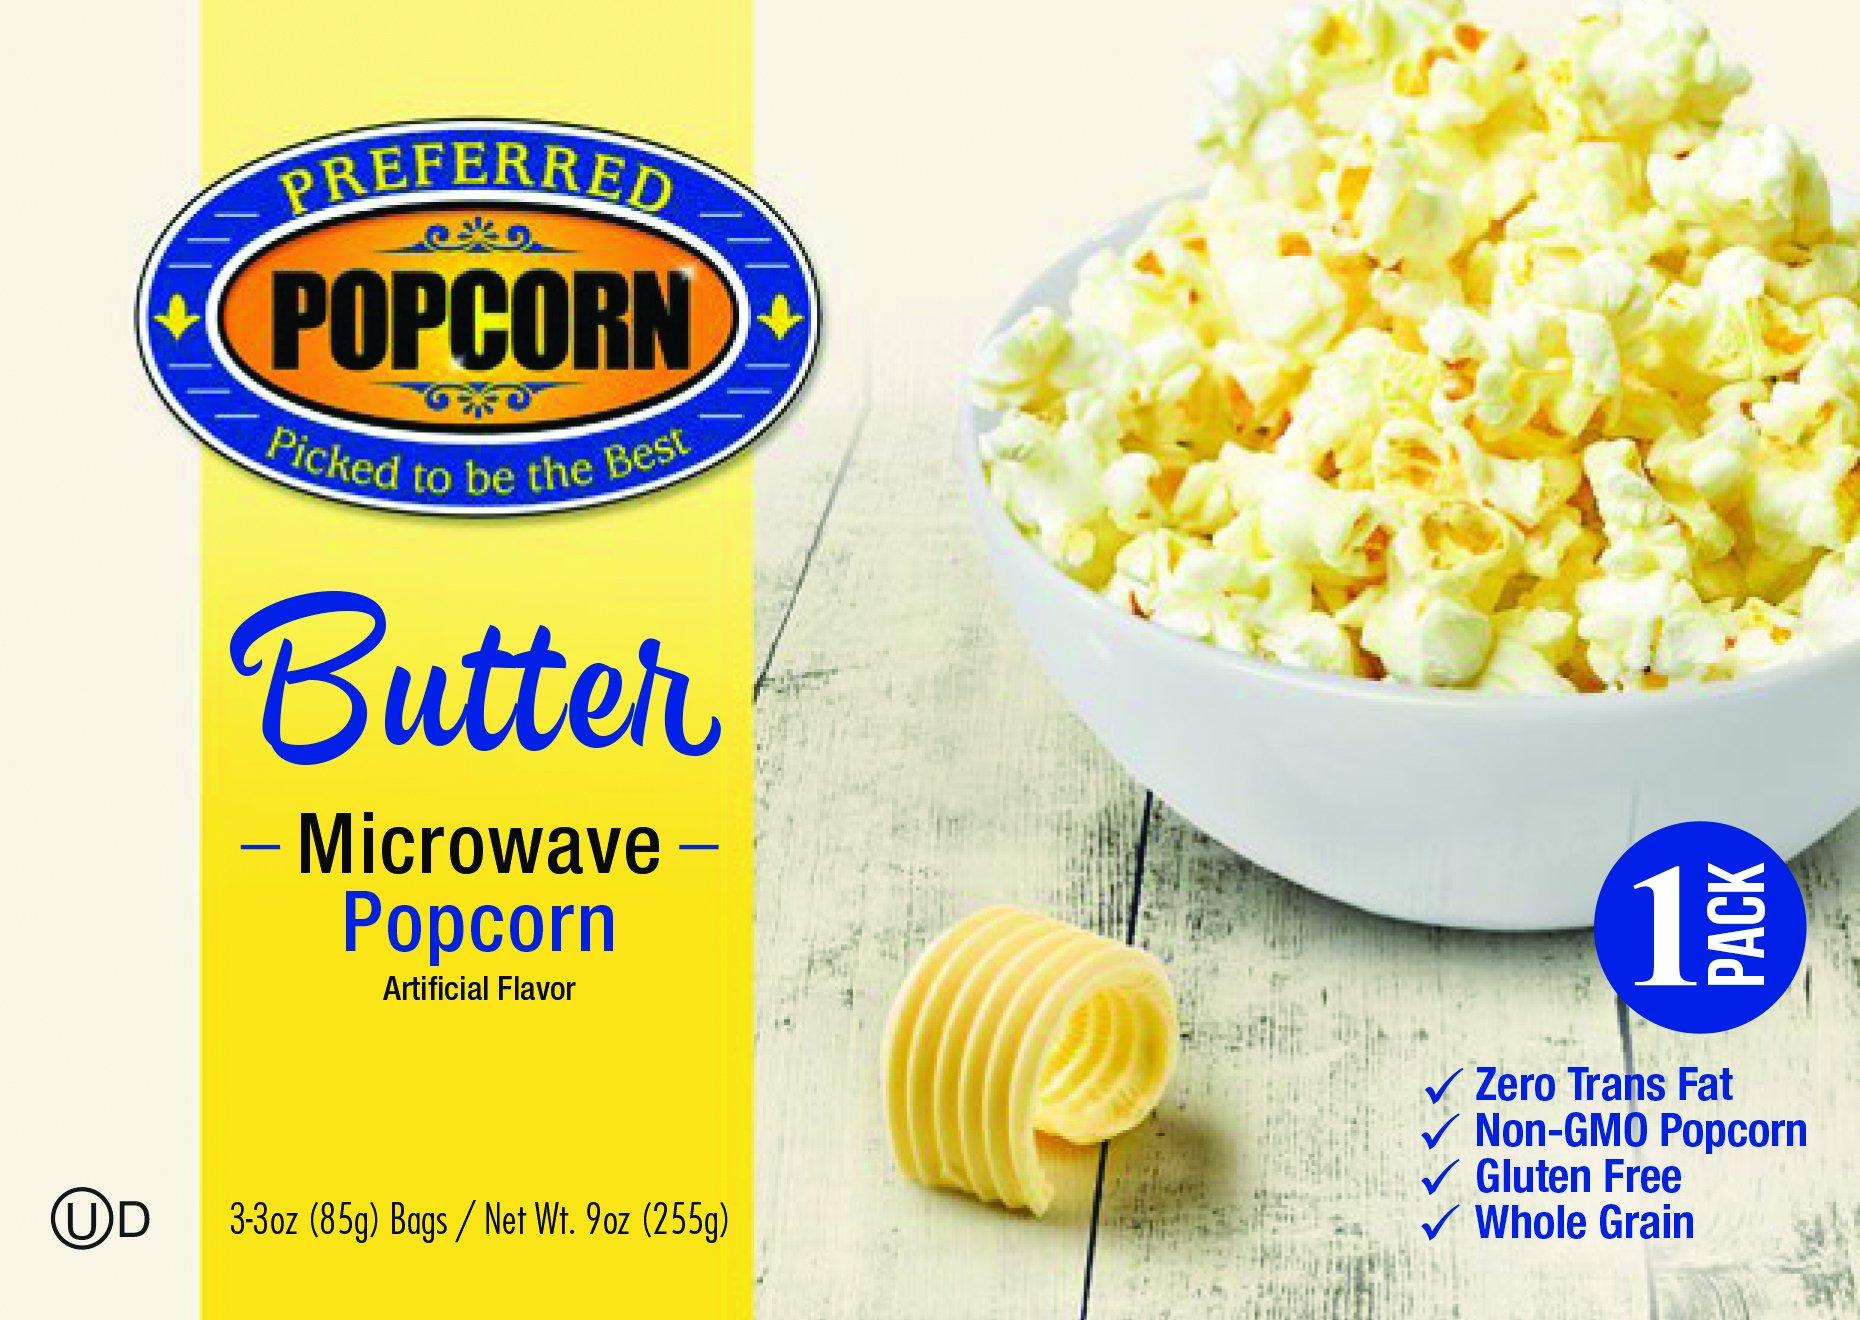 Microwave Butter Popcorn - Preferred Popcorn - One 3.0 oz Bag - 100% Farmer Owned - USA Made - Made in Nebraska - Popcorn Snack - Gluten Free - Whole Grain - Non GMO - Fresh Popcorn